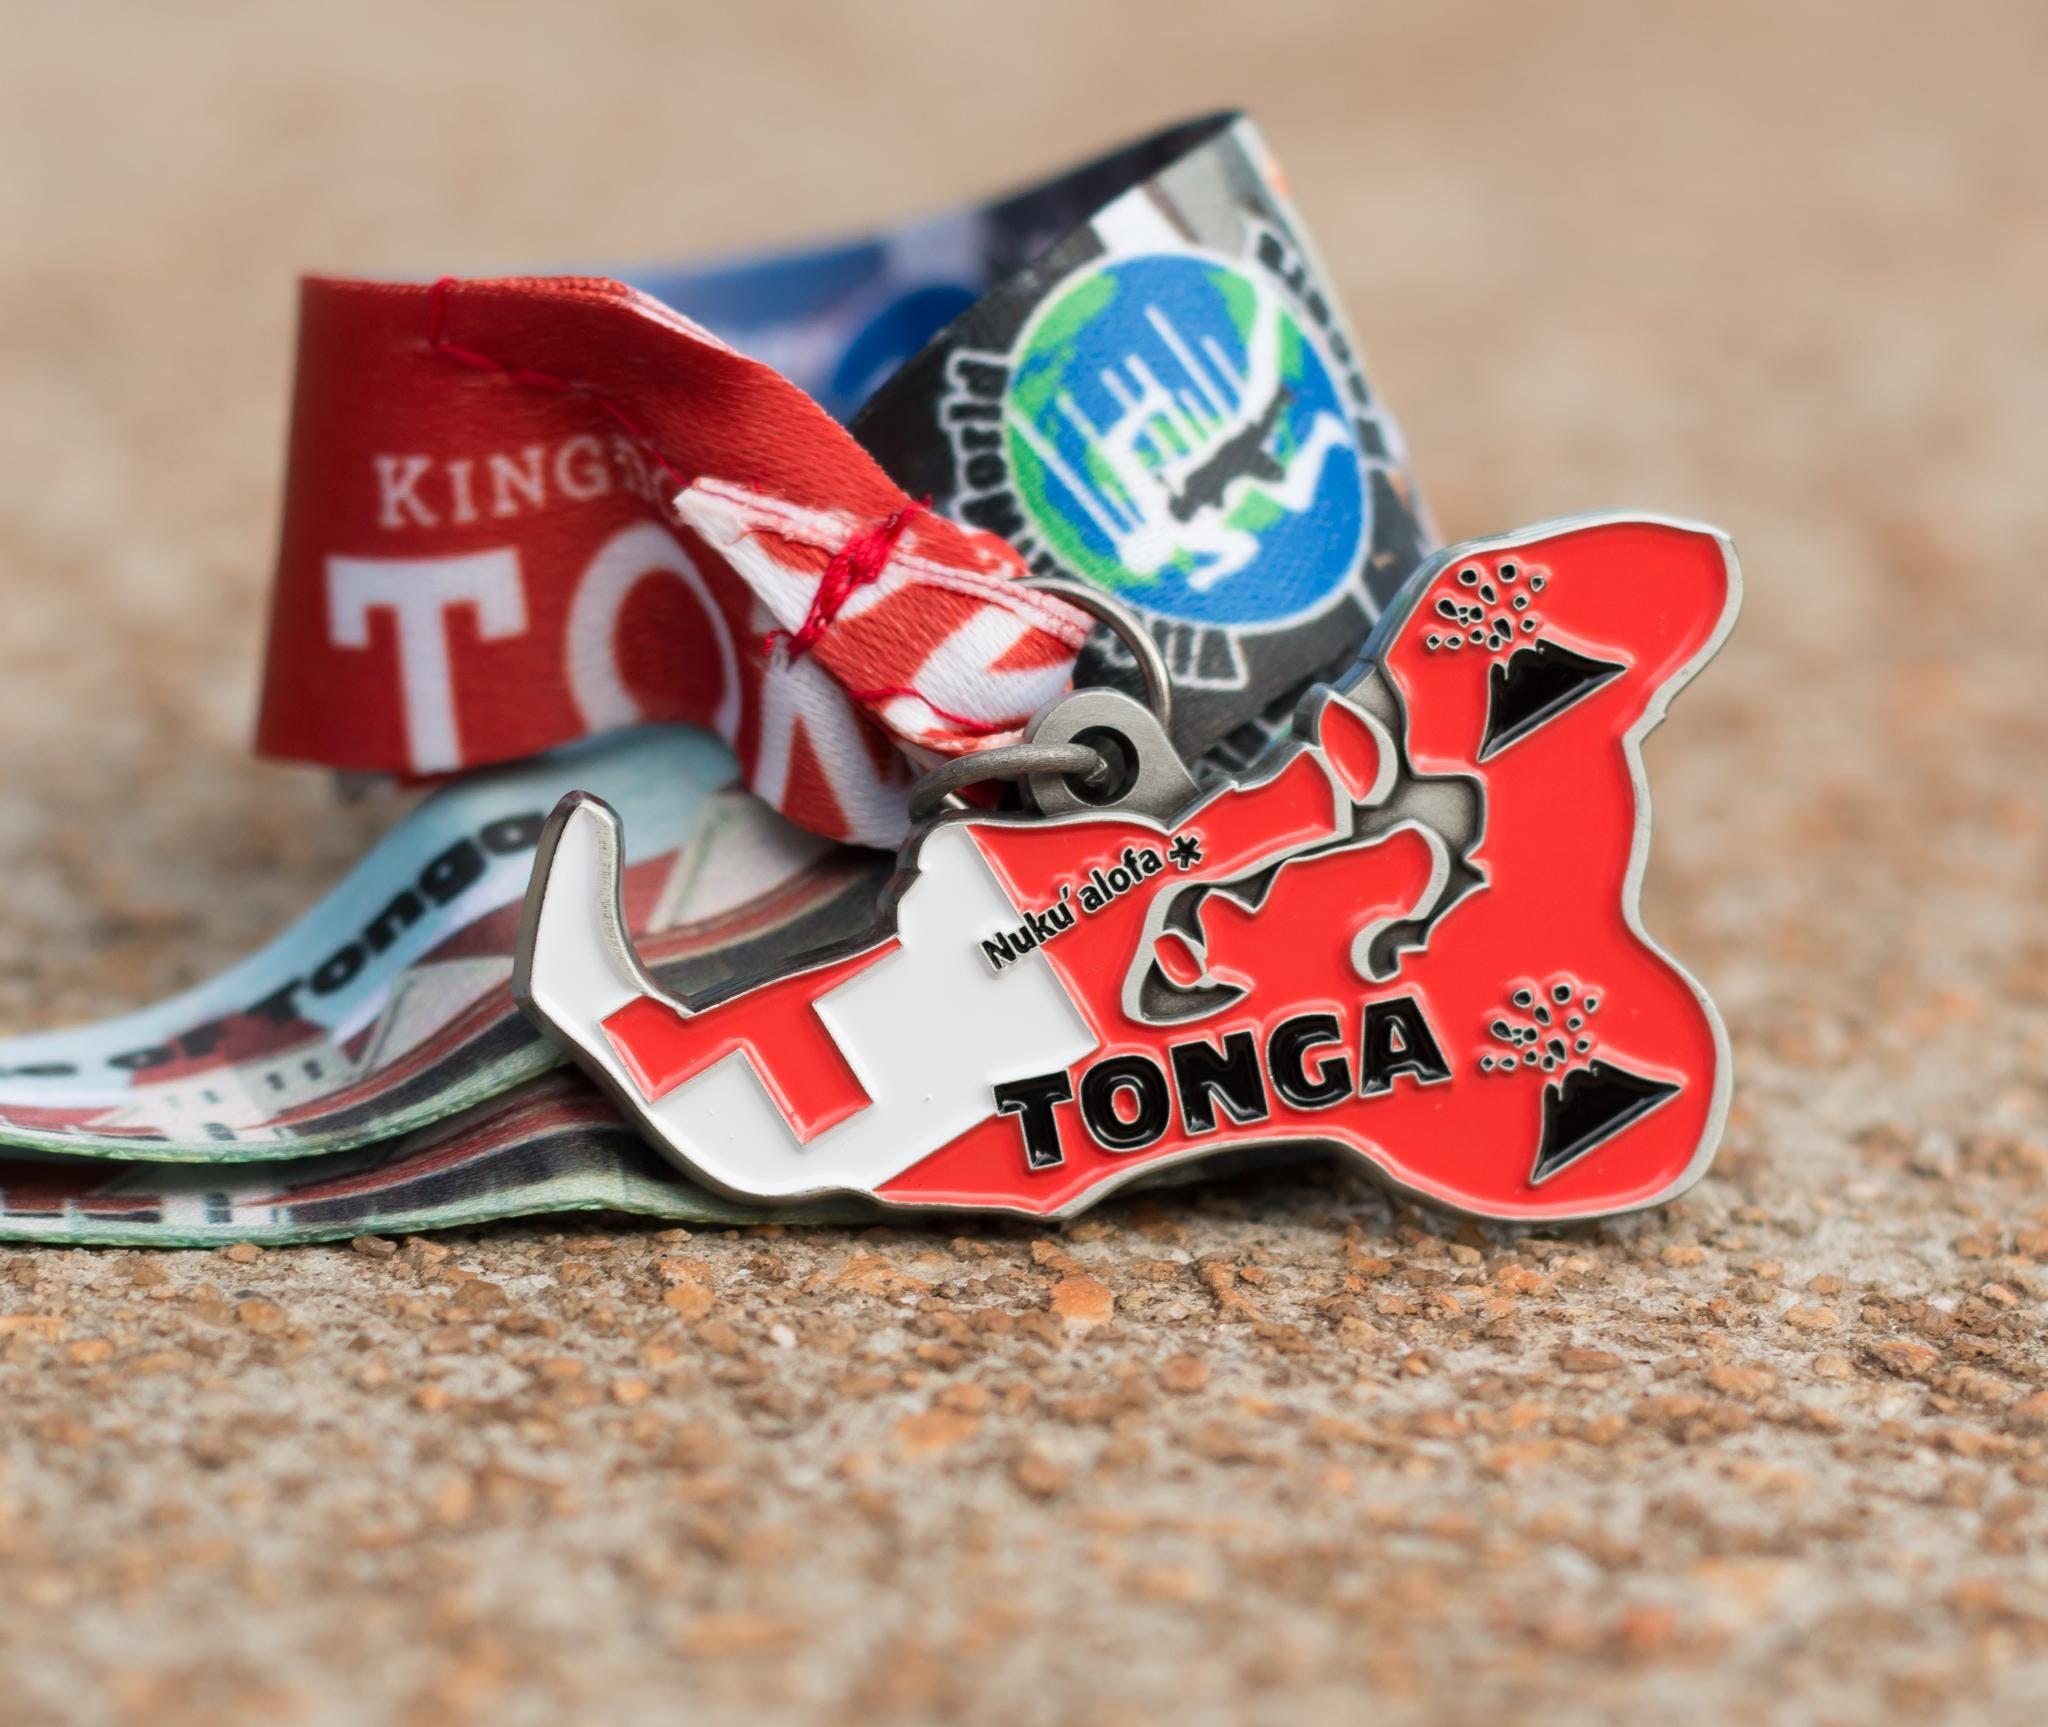 Now Only $10! Race Across Tonga 5K, 10K, 13.1, 26.2 - Las Vegas